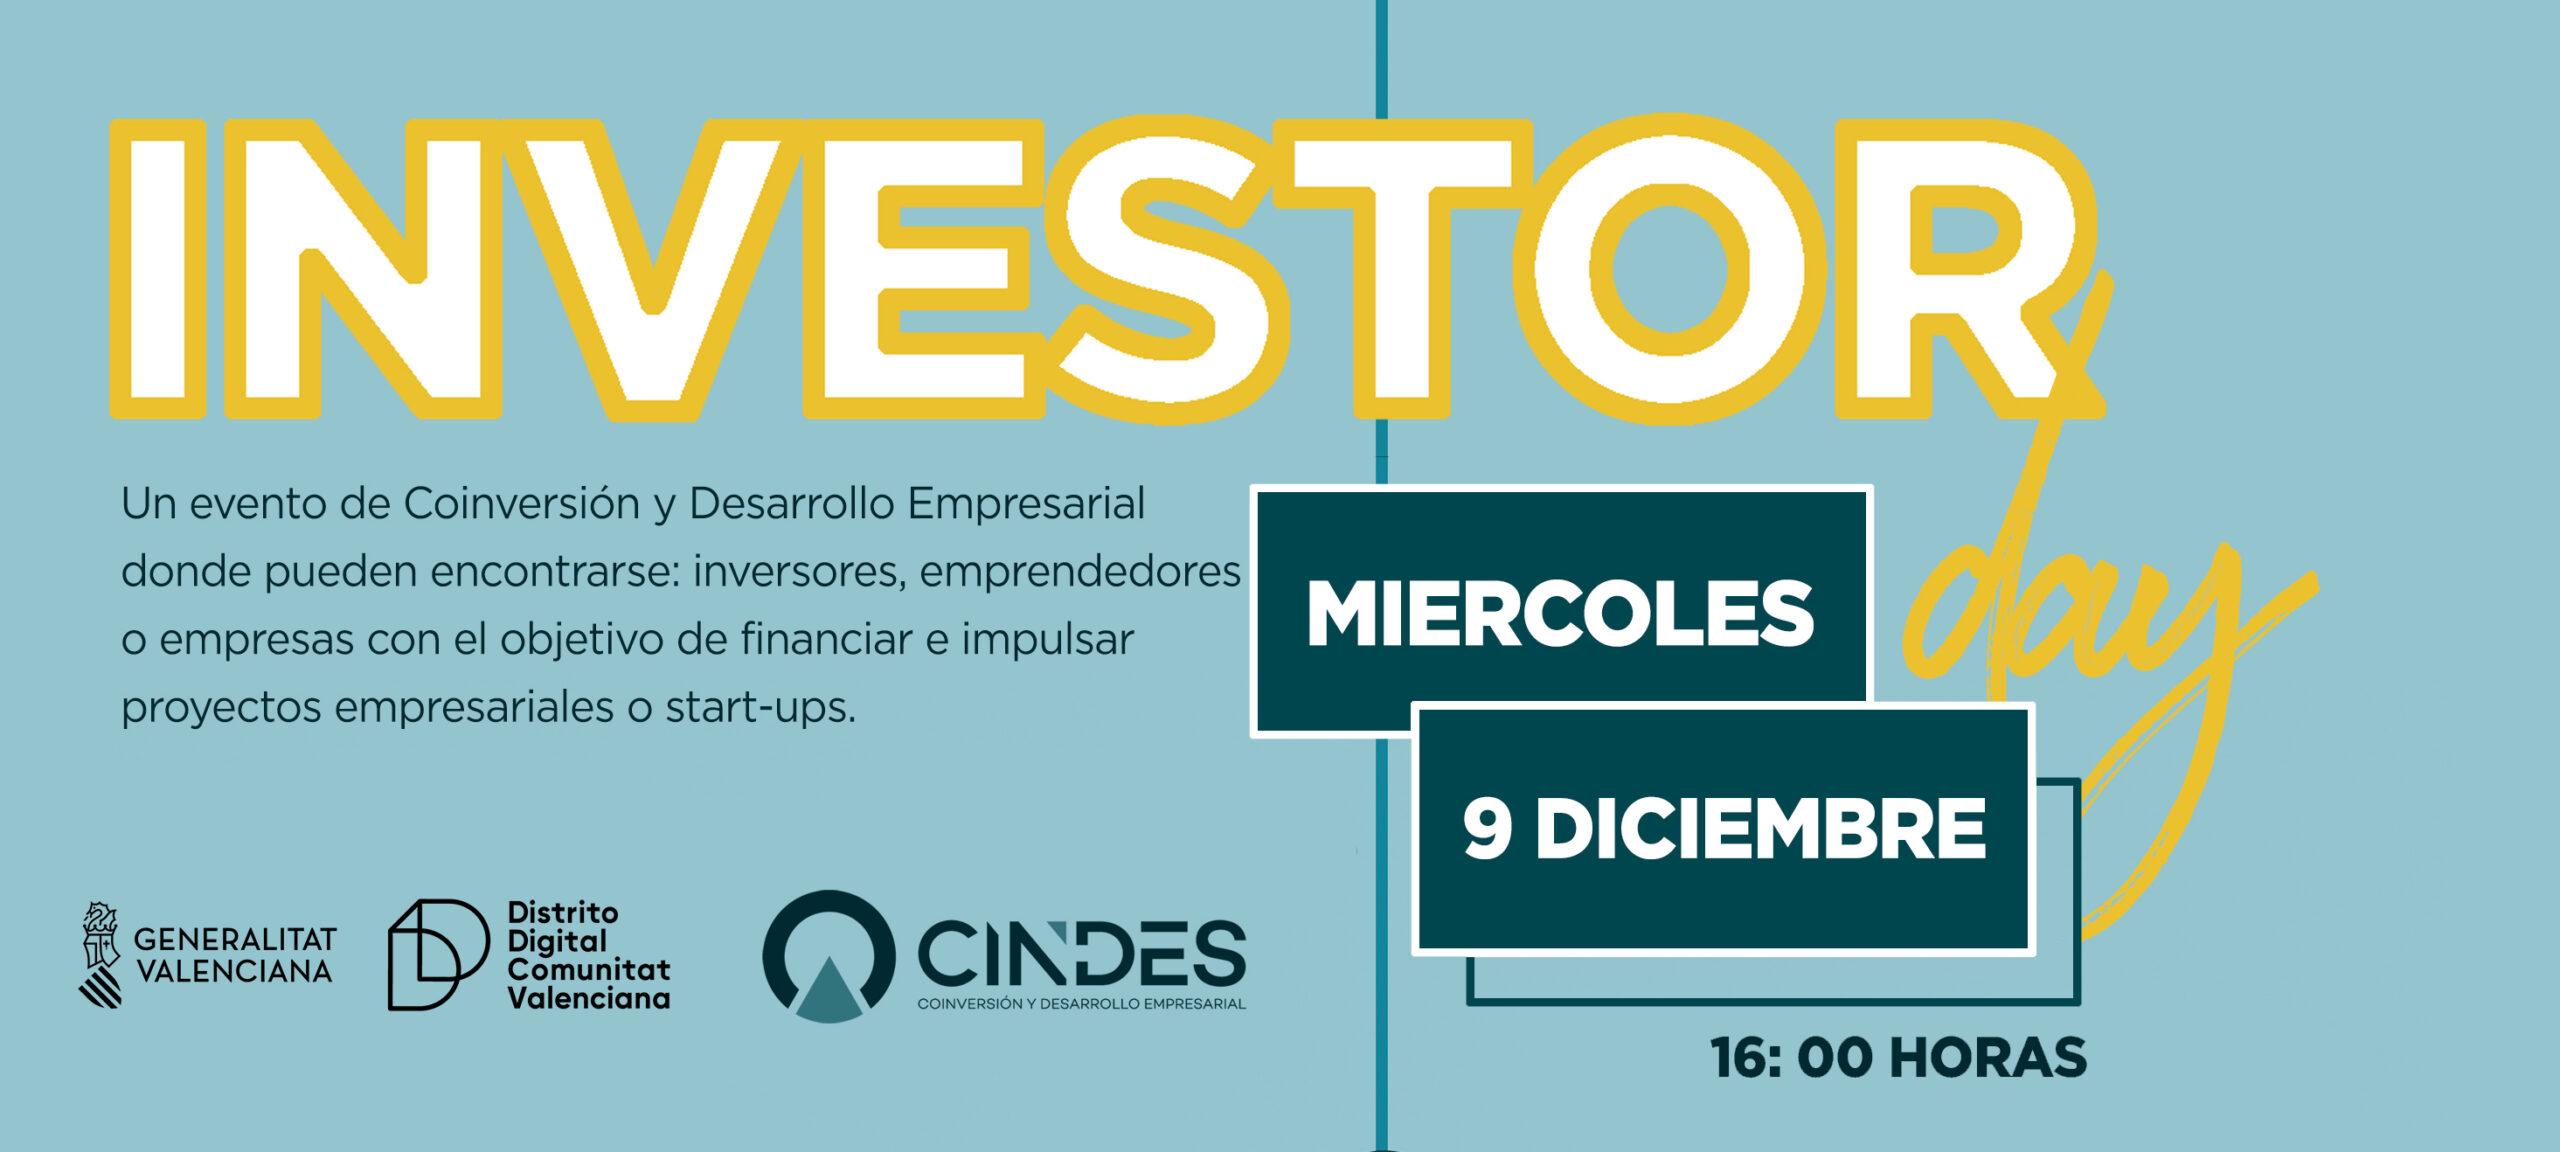 Banner Investor Day Distrito Digital CINDES